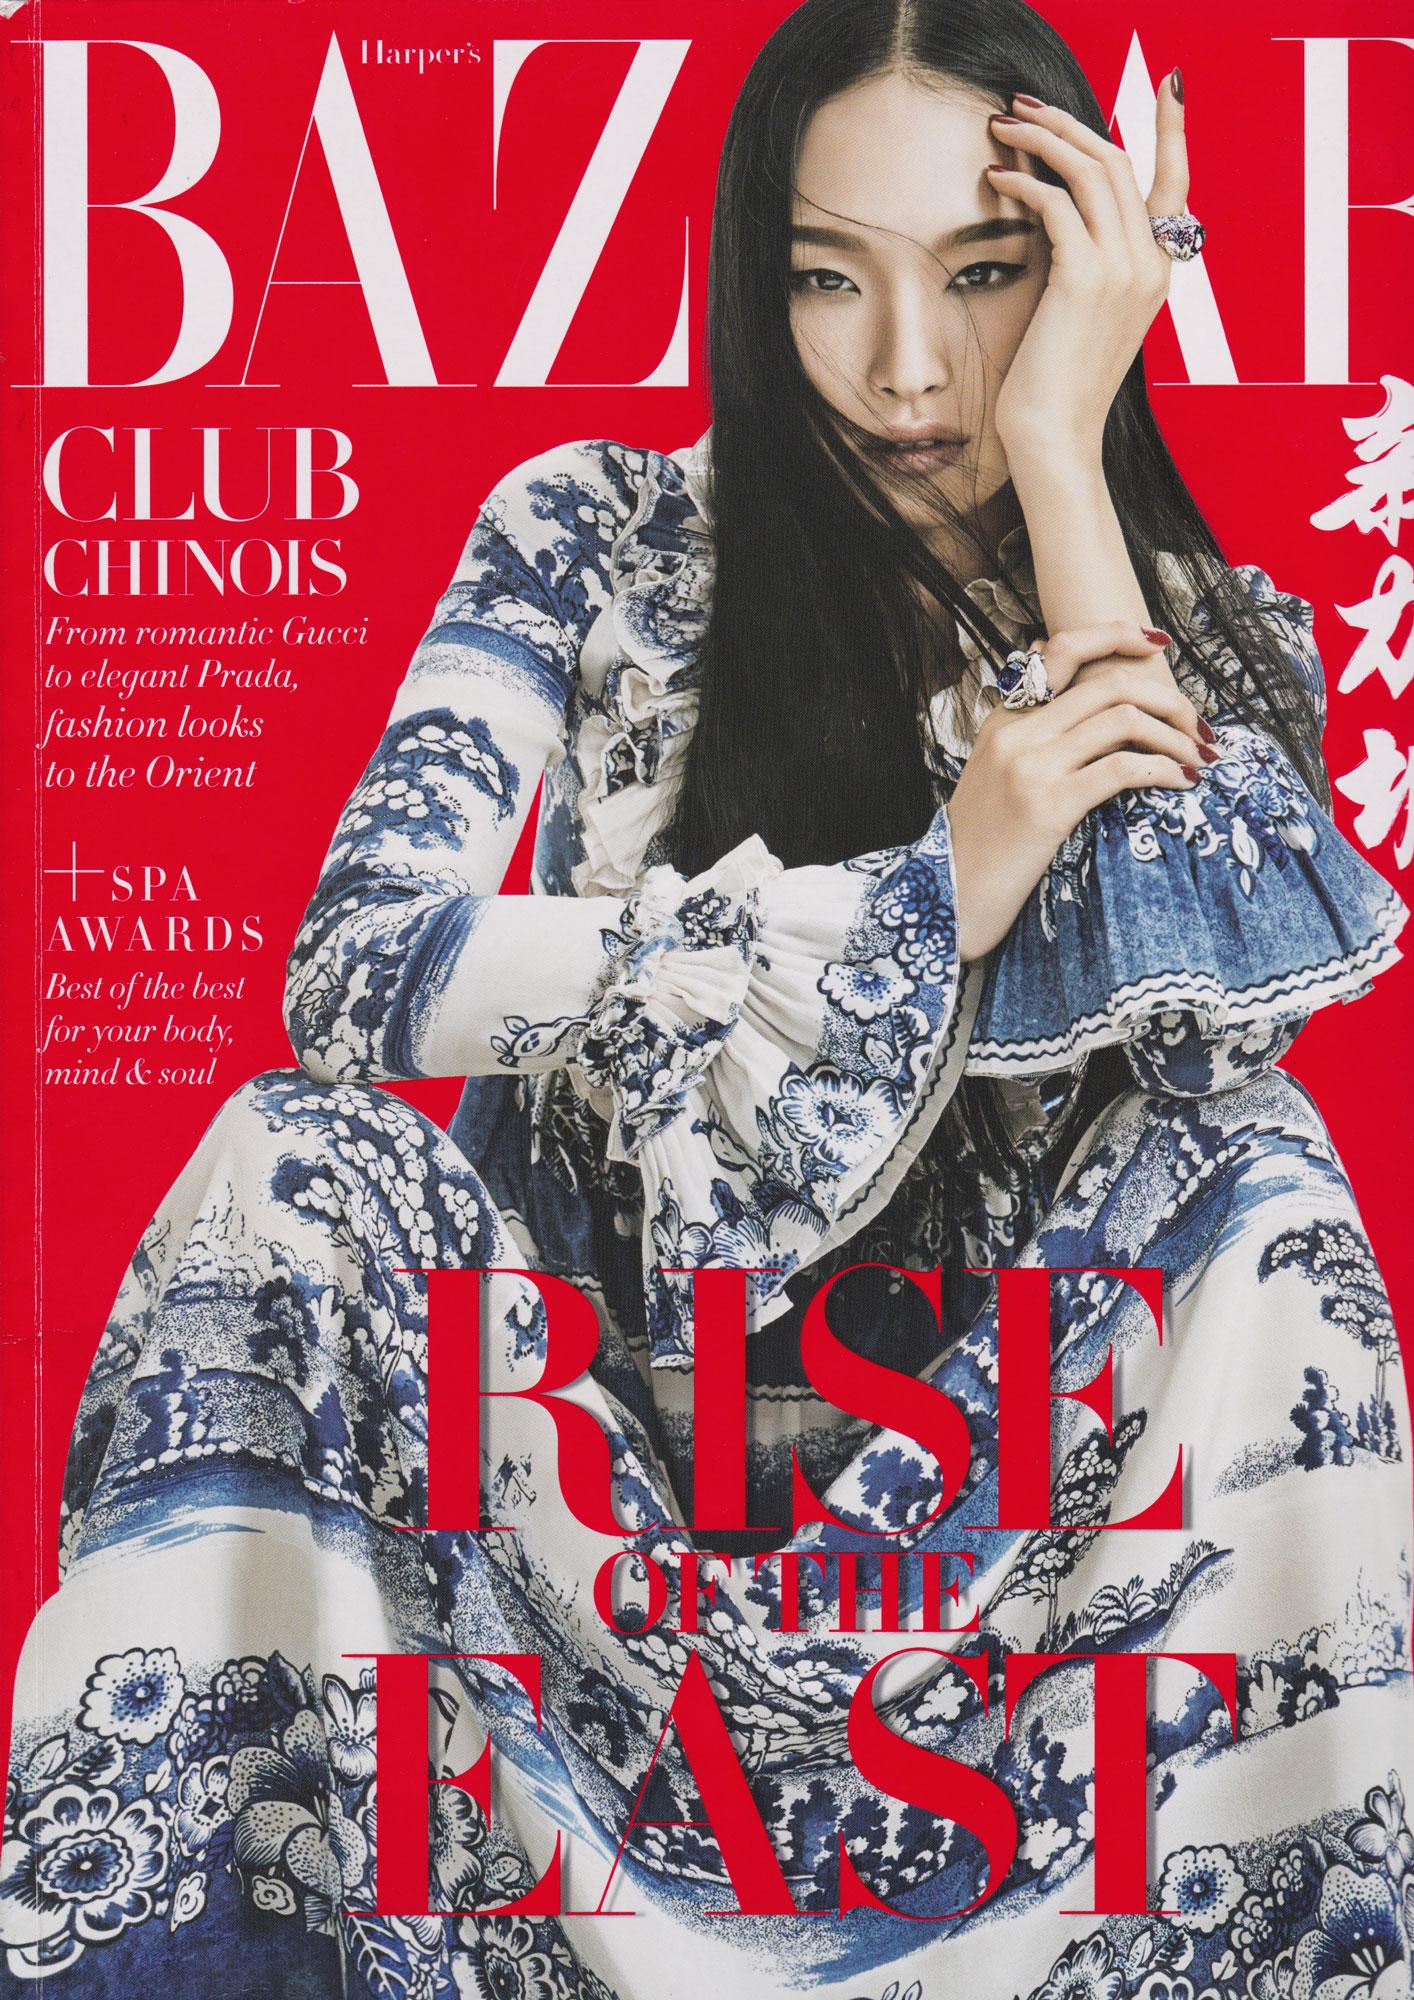 Harper's-Bazaar--Feb-2017-Cover.jpg